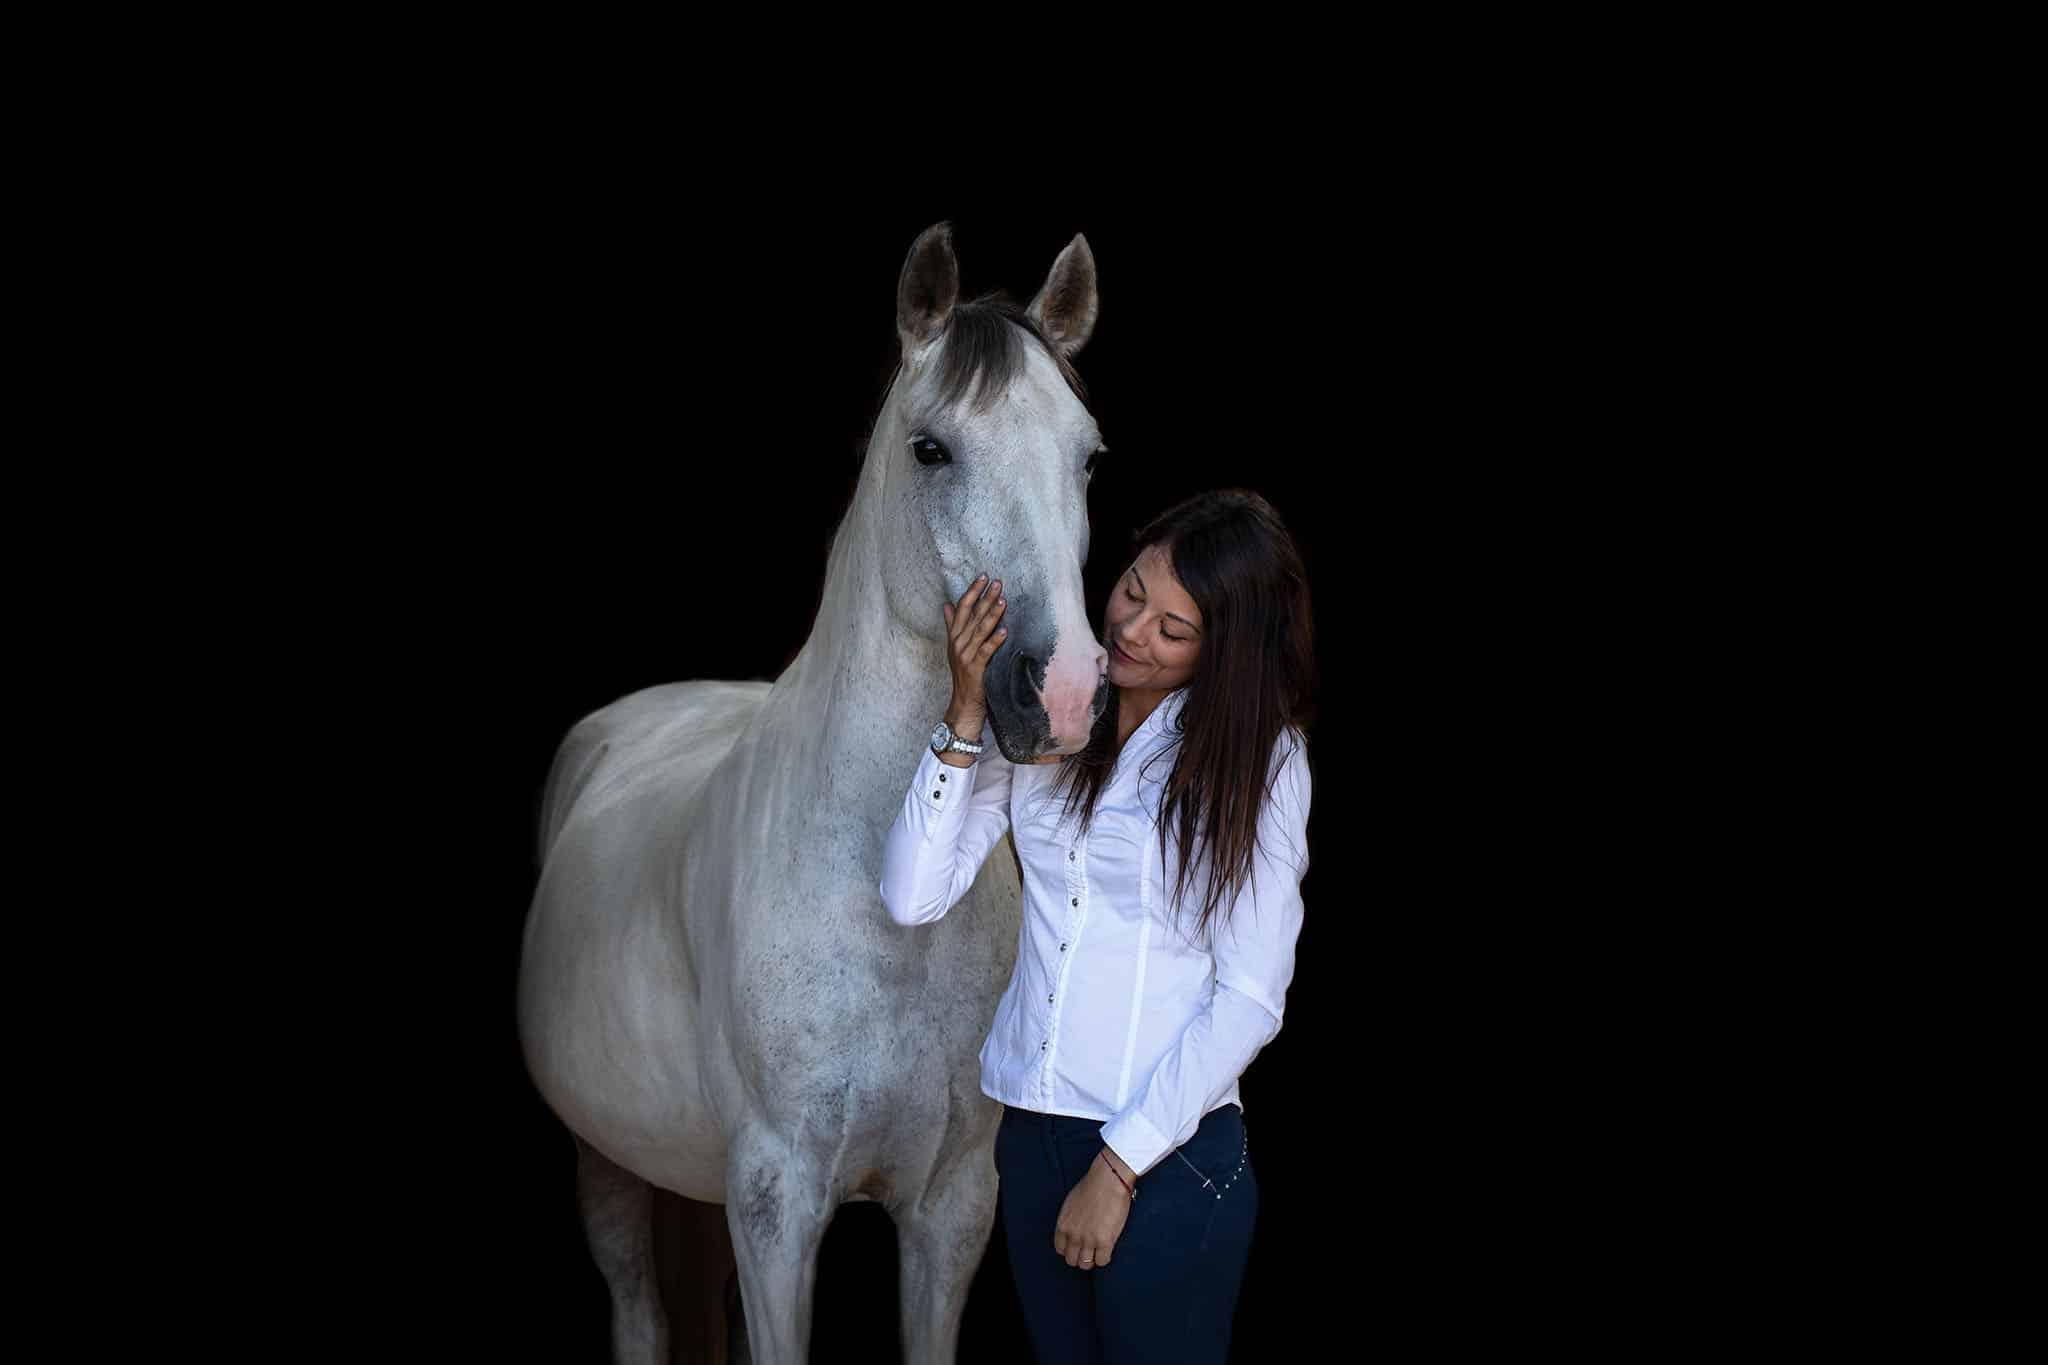 fond-noir-cheval